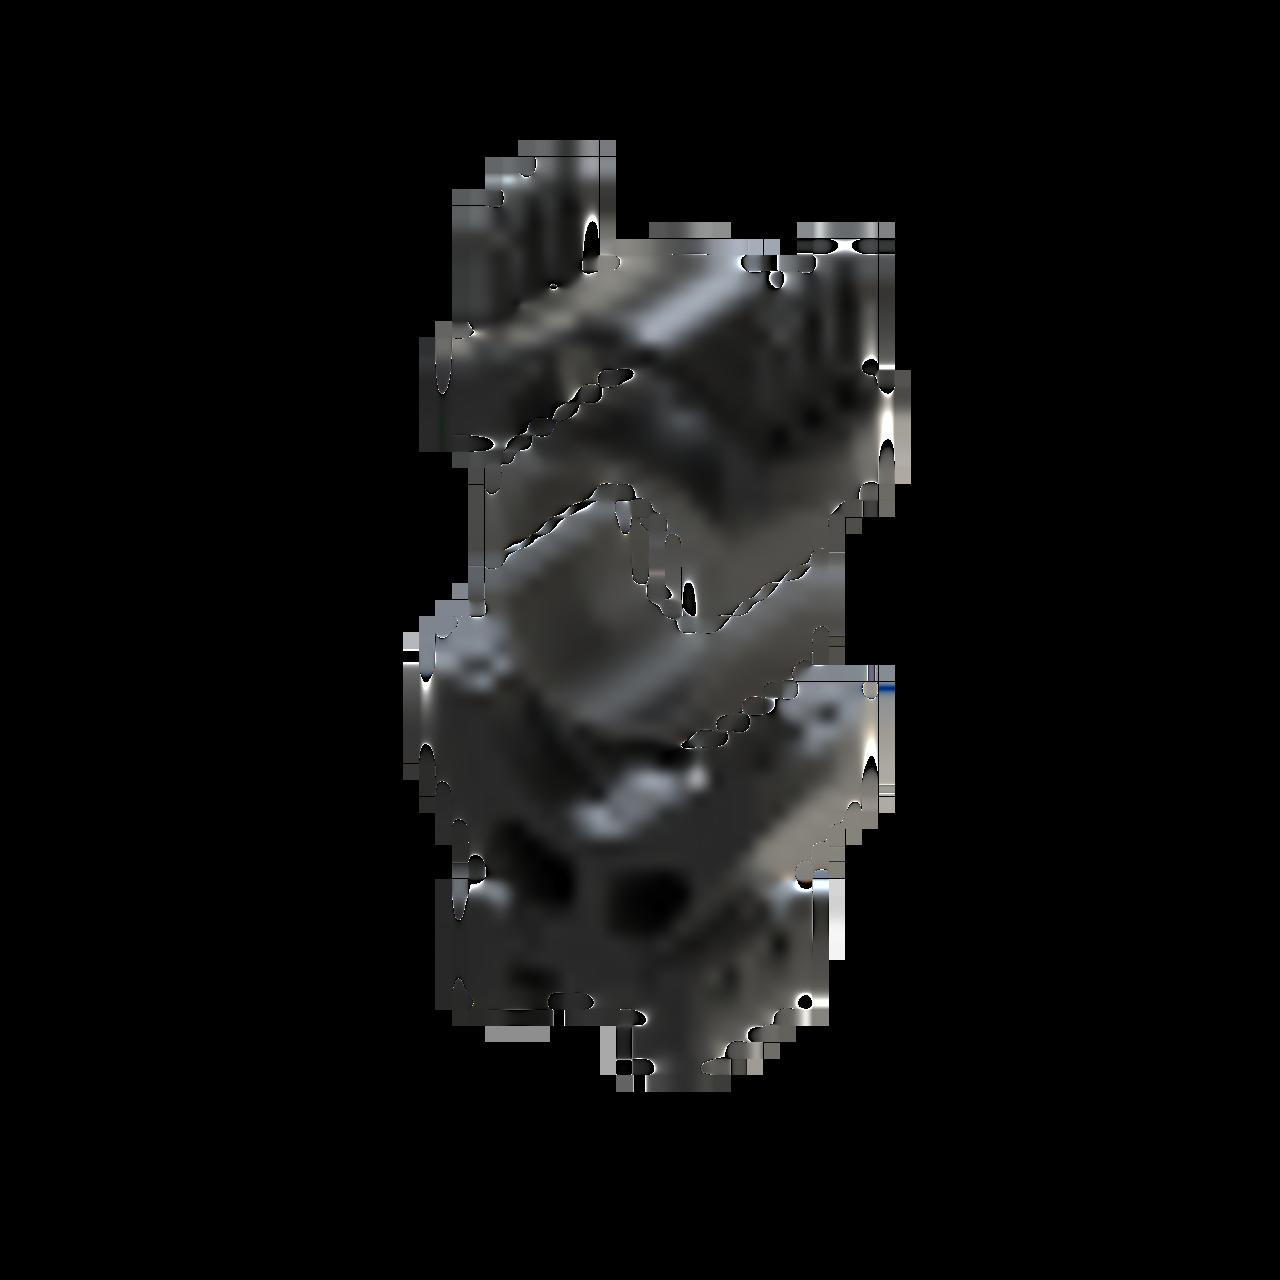 Burris - XTR Signature Rings™ with Pos-Align Inserts